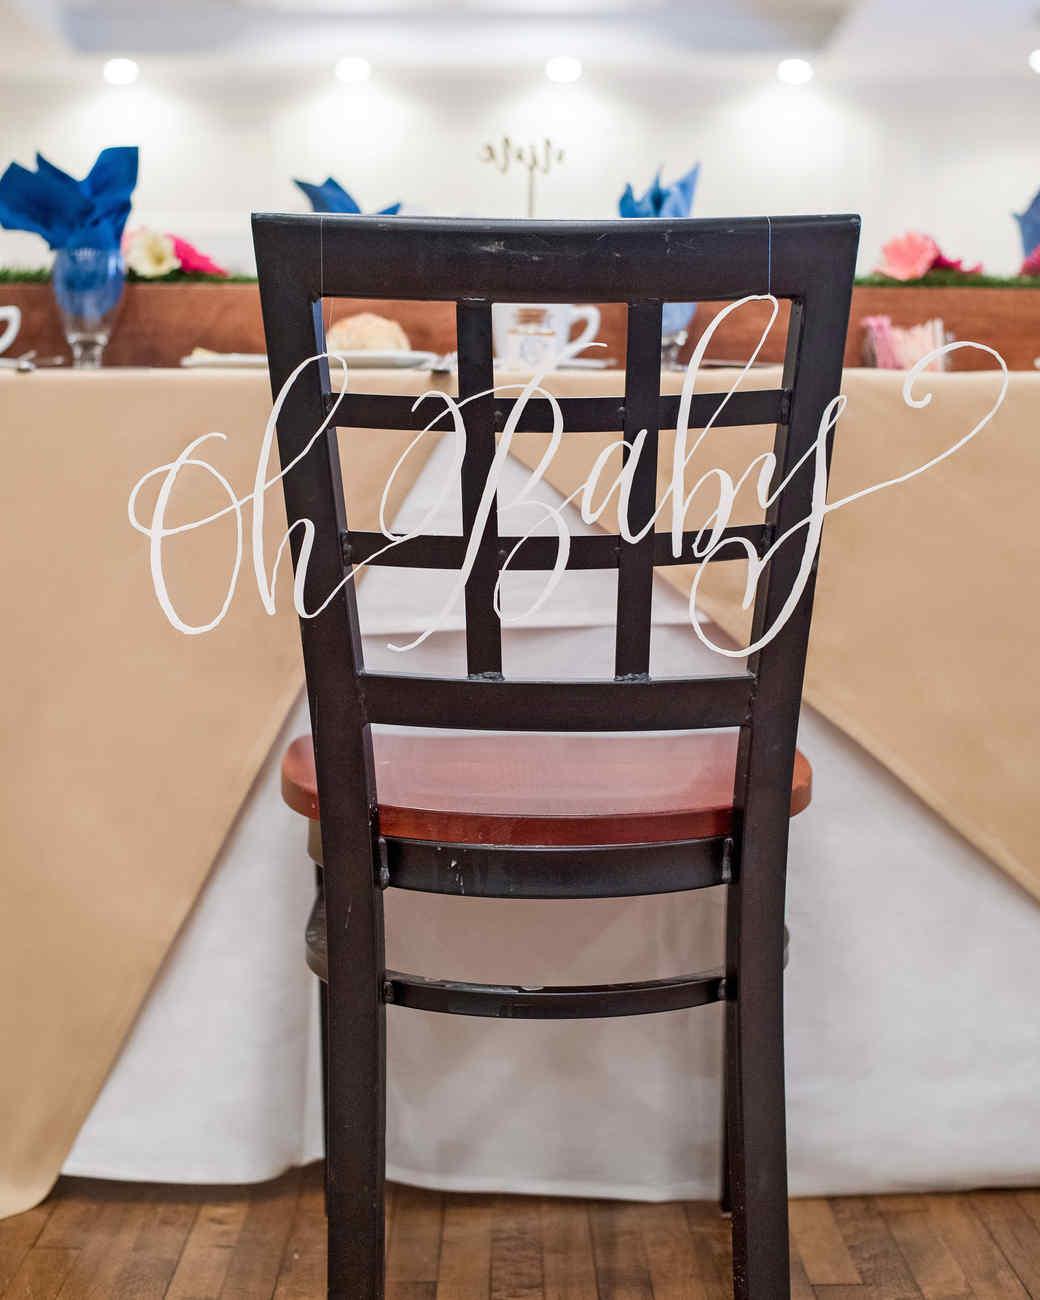 mangiolino oh baby chair